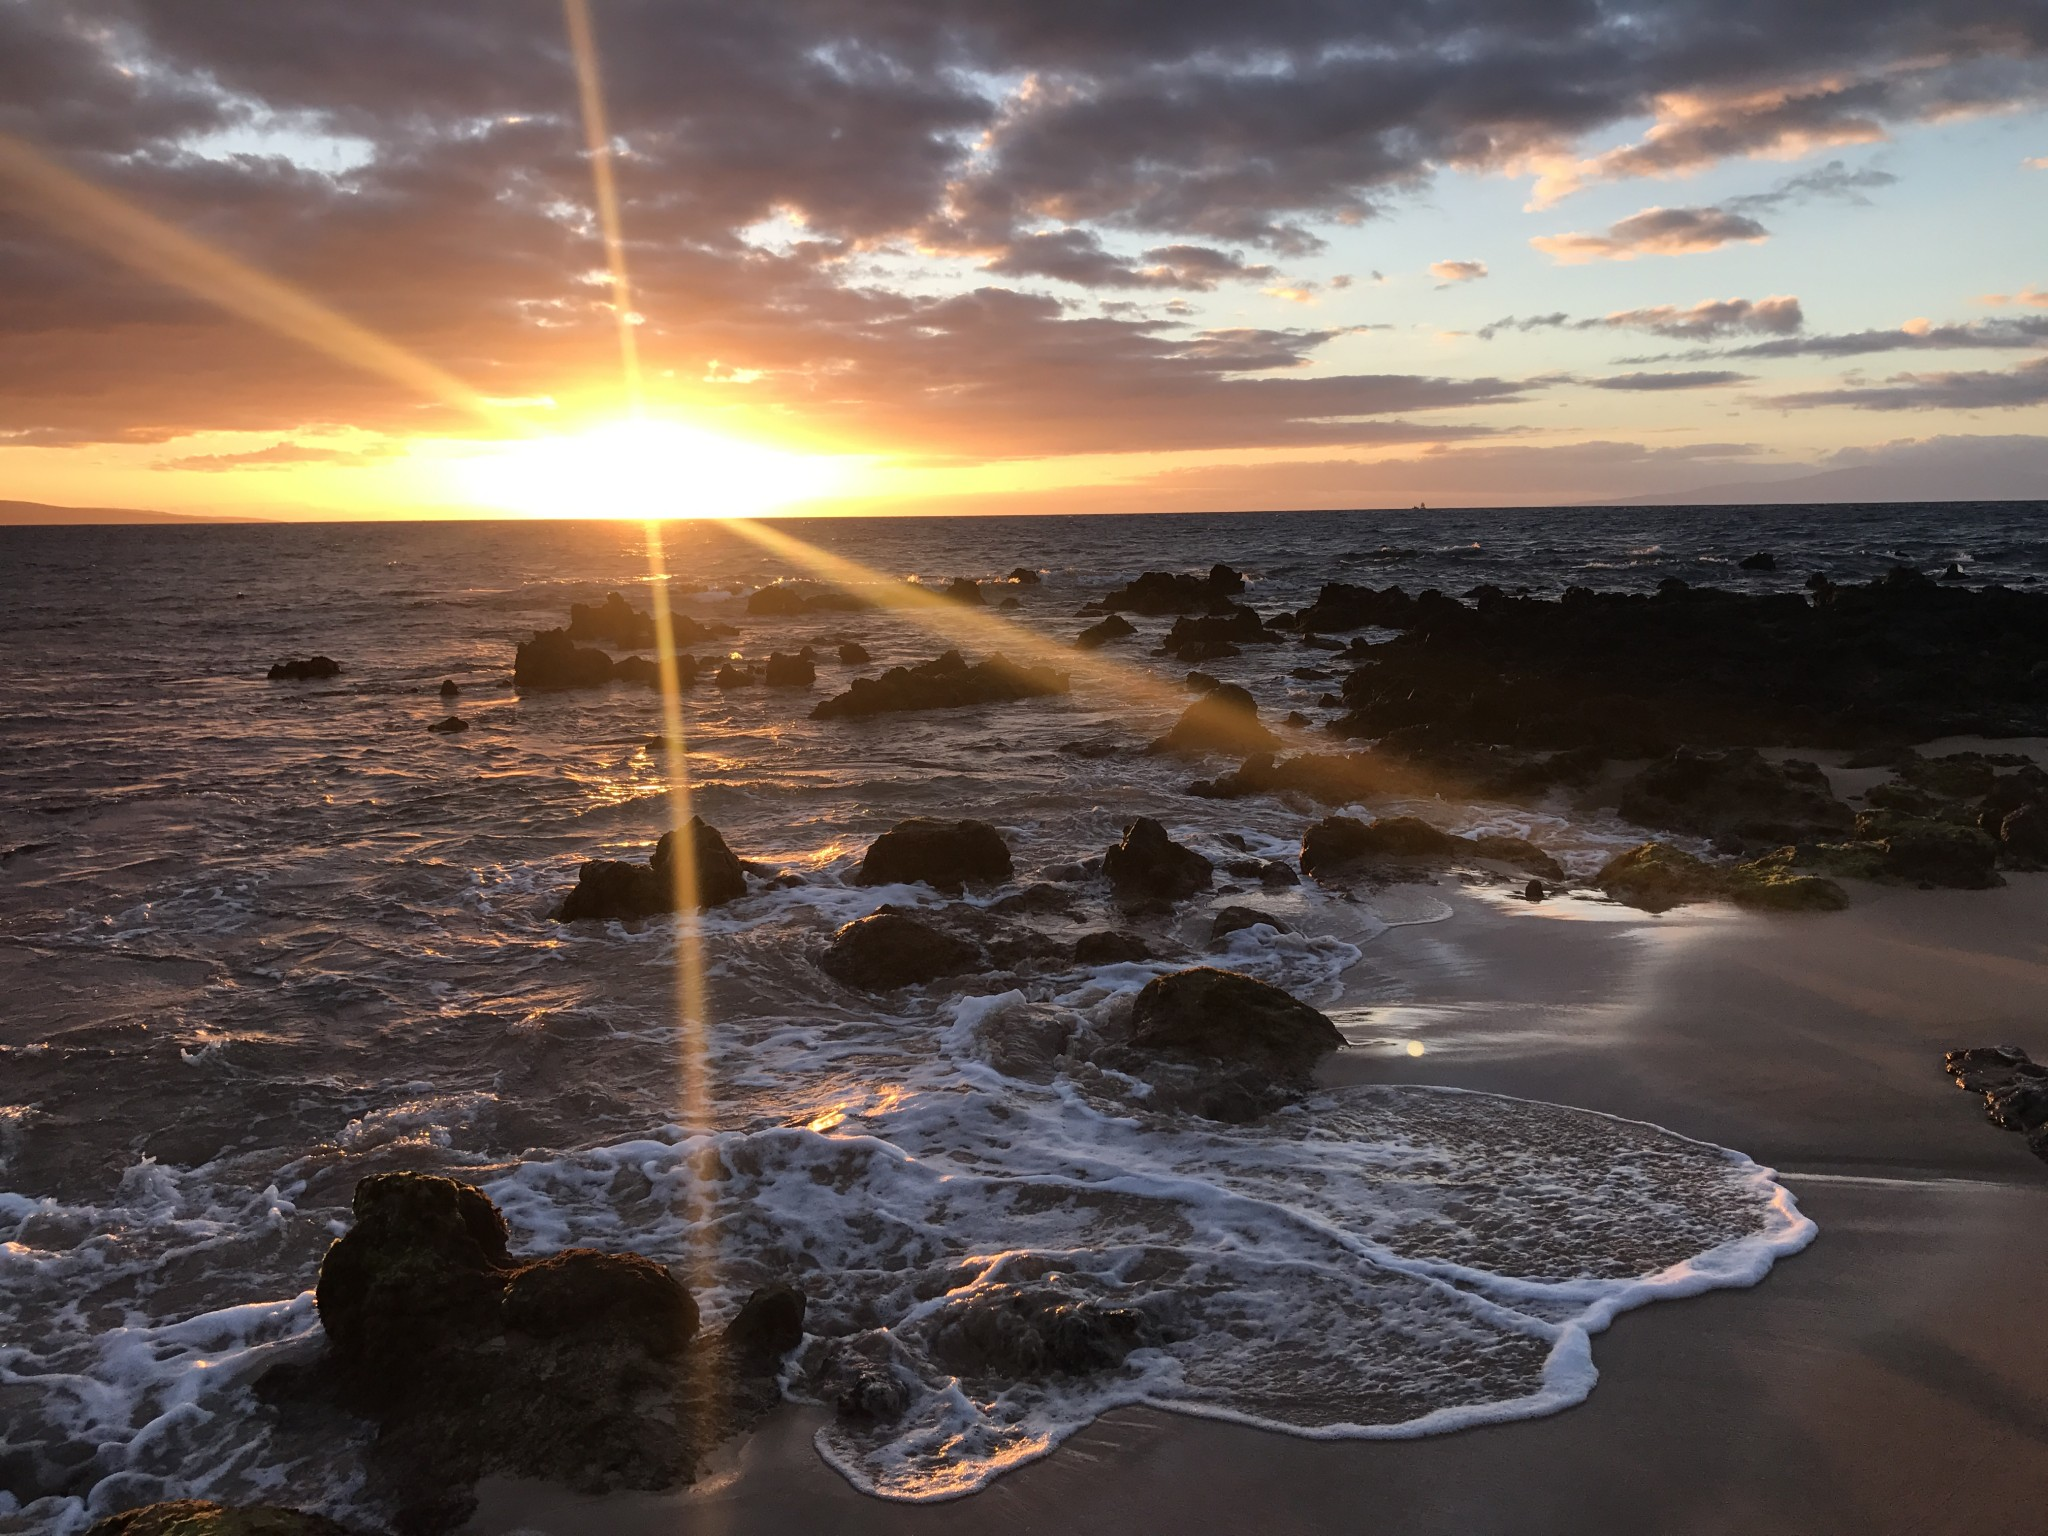 keawakapu beach sunset, maui, the-alyst.com